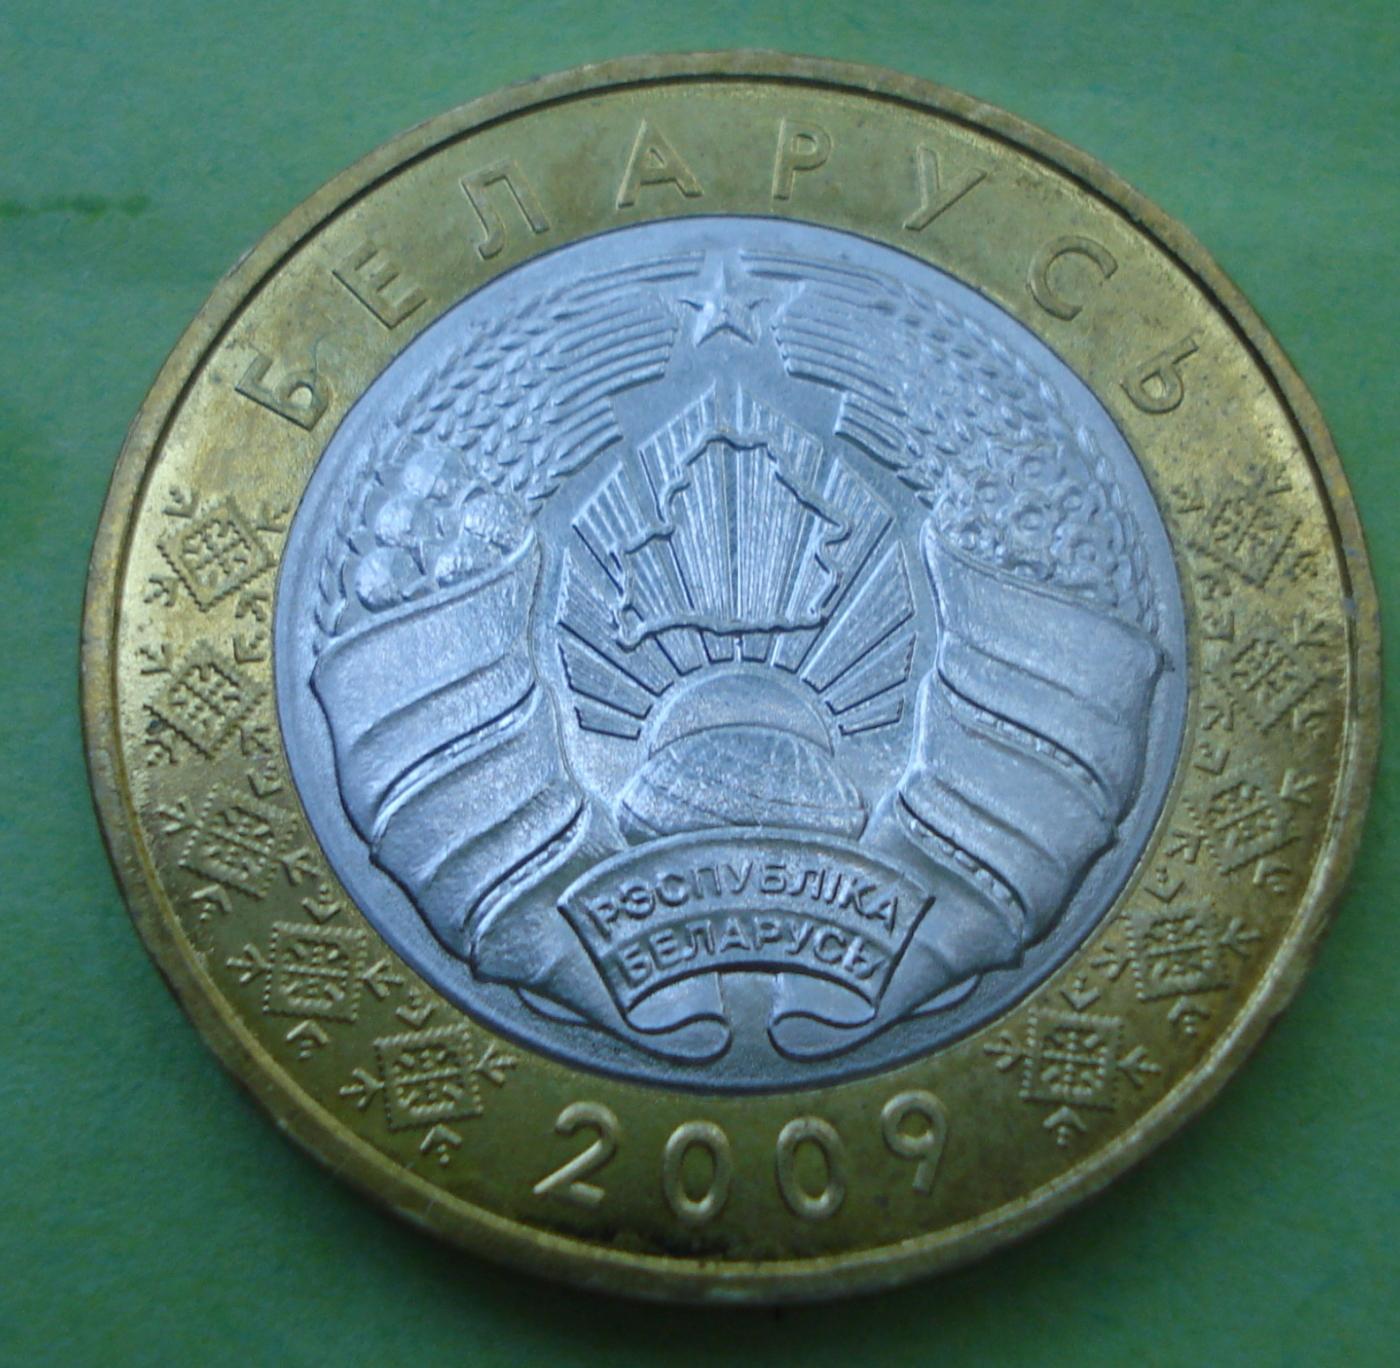 Belarus Set 8 Coins UNC 1 2 5 10 20 50 Kopeeck 1 2 Rubles 2009